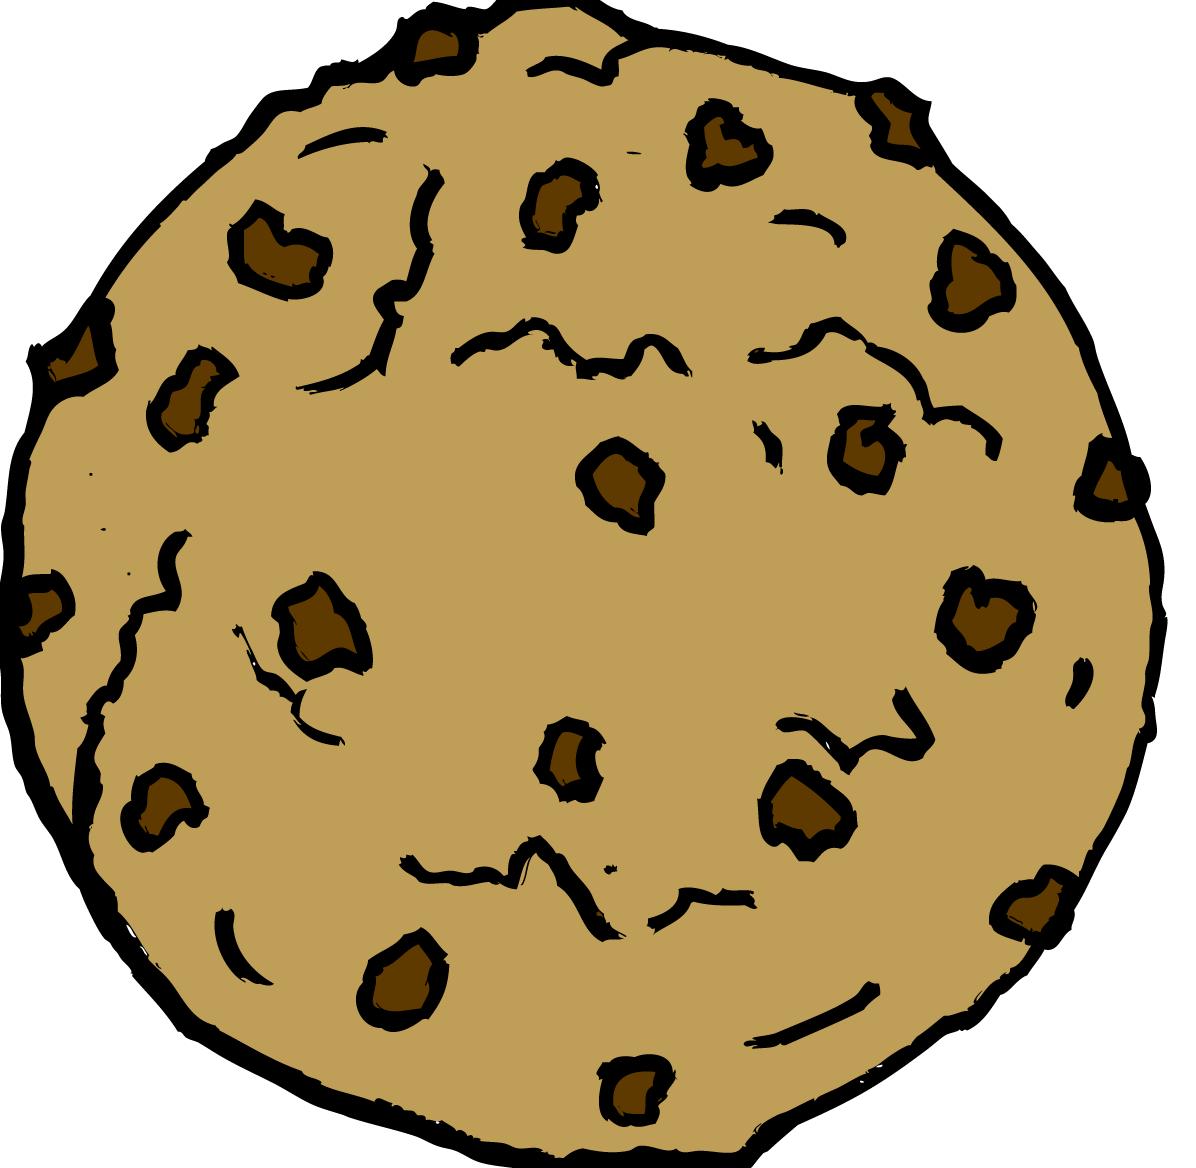 1196x1168 Cookies Clipart